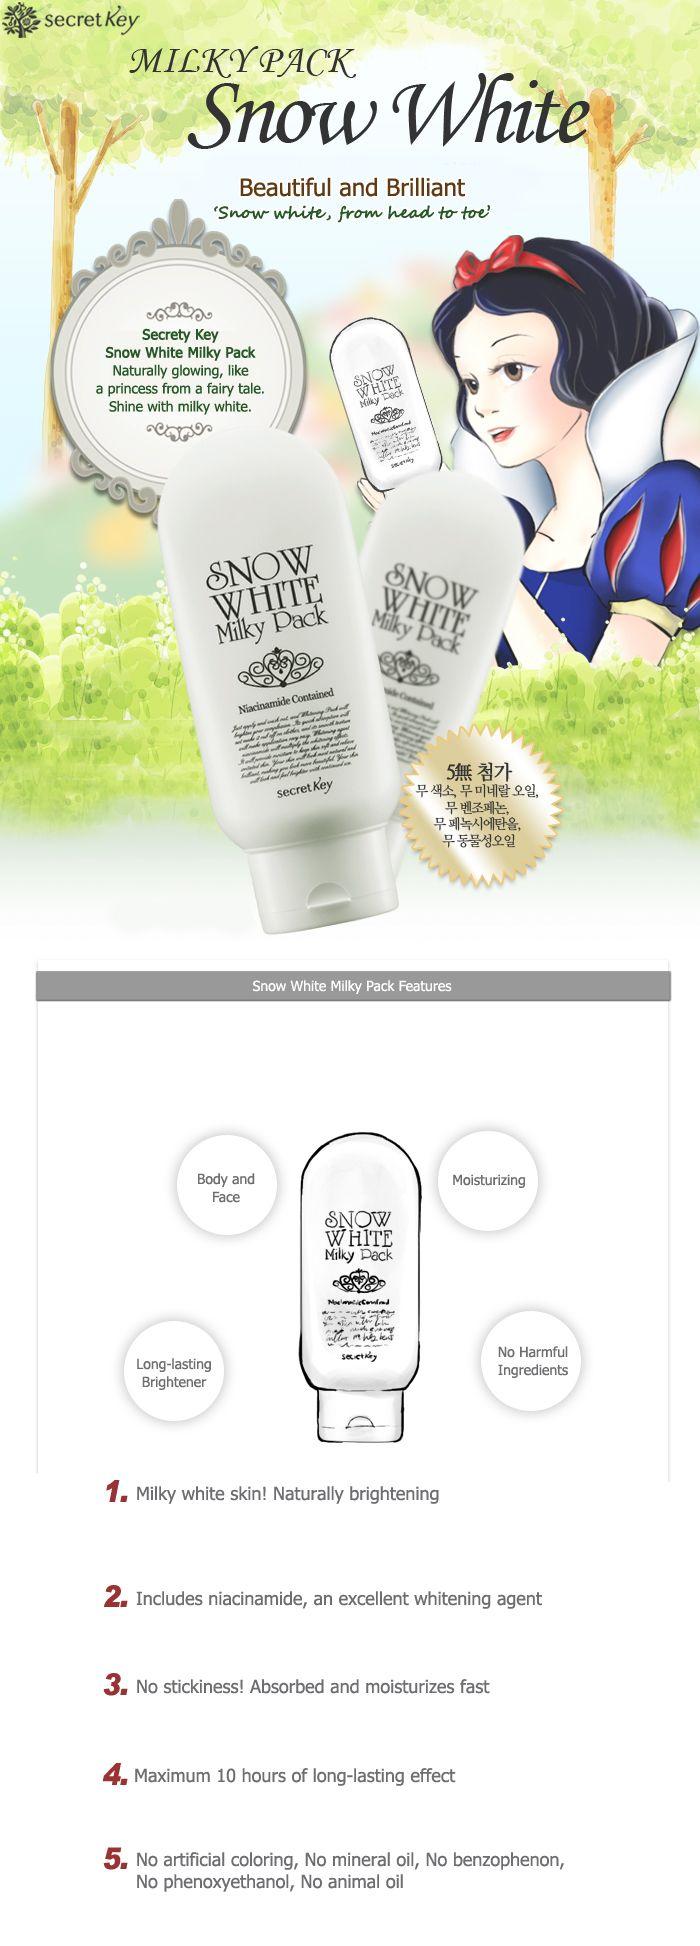 secretKey - Snow White Milky Pack 200g